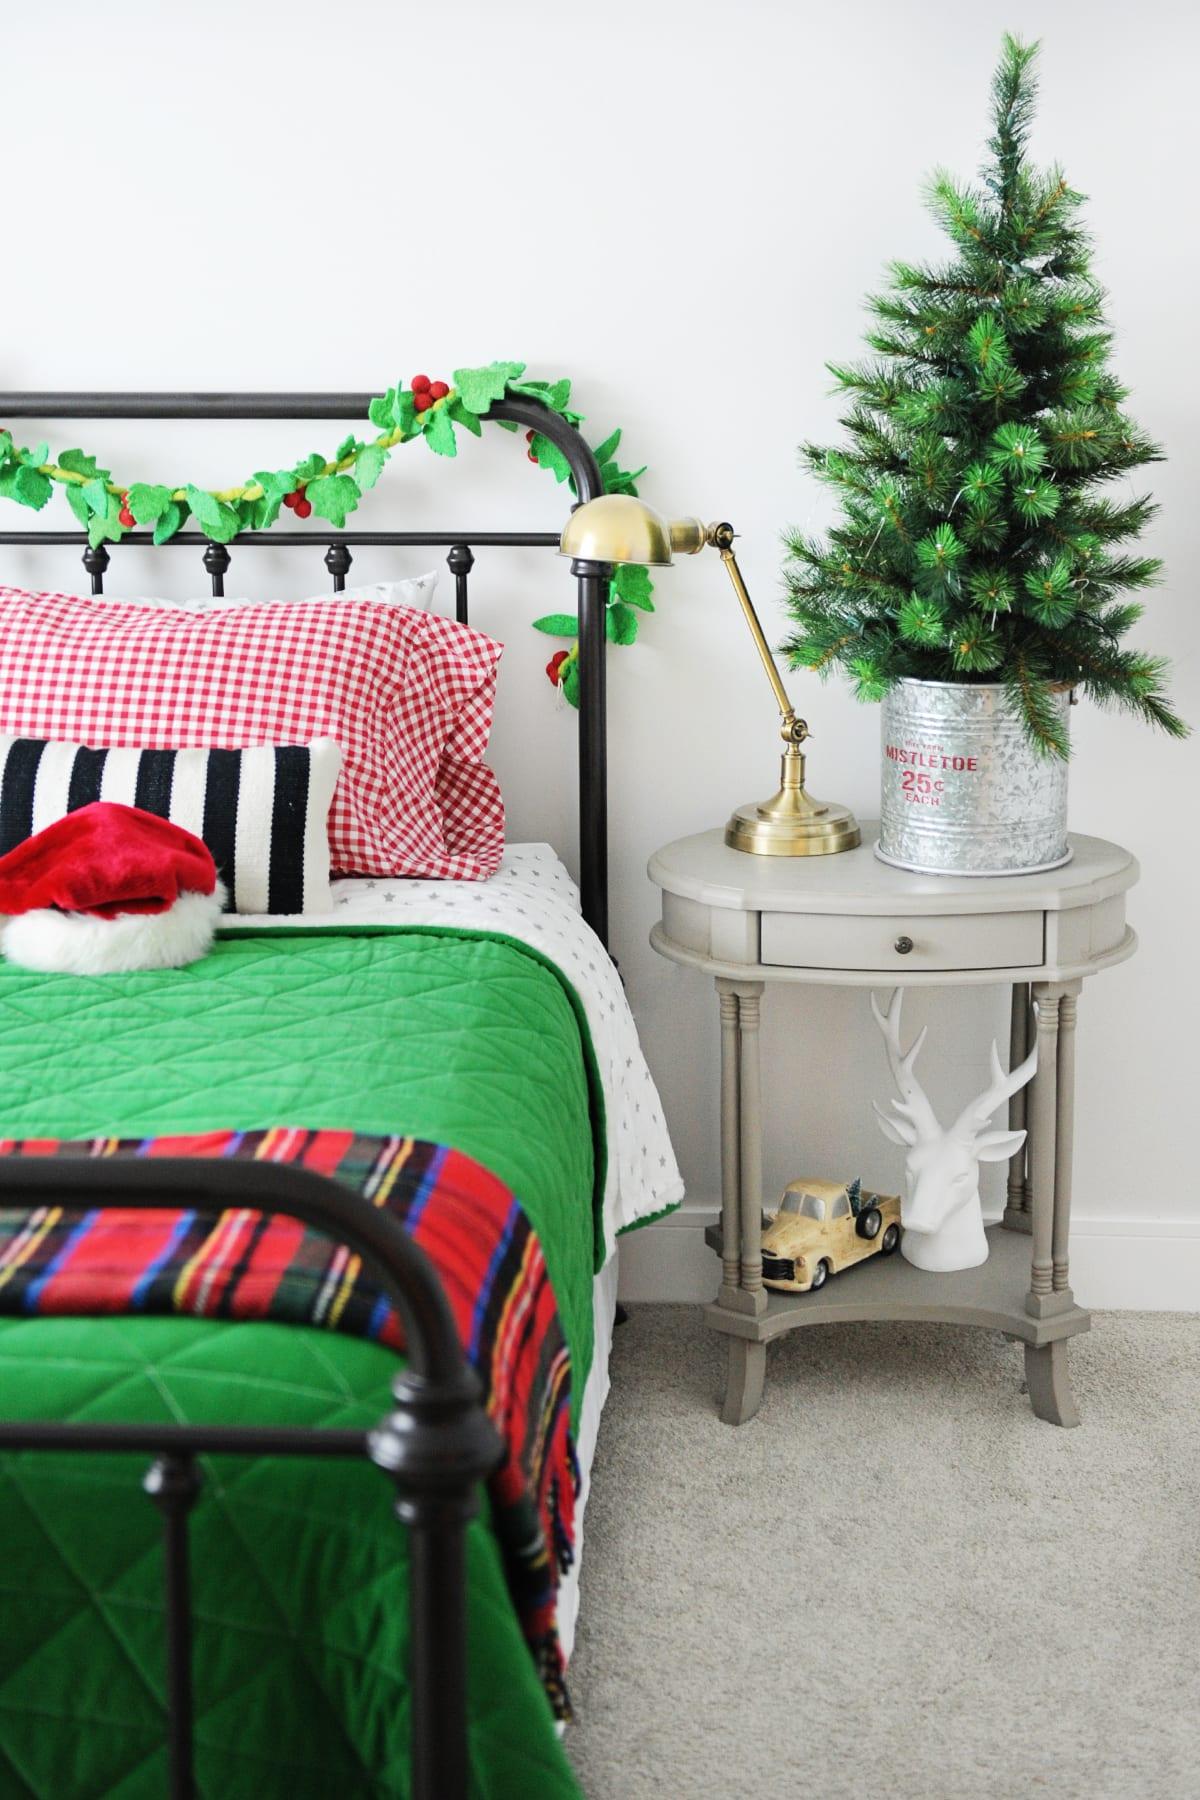 Christmas kids bedroom decorating ideas